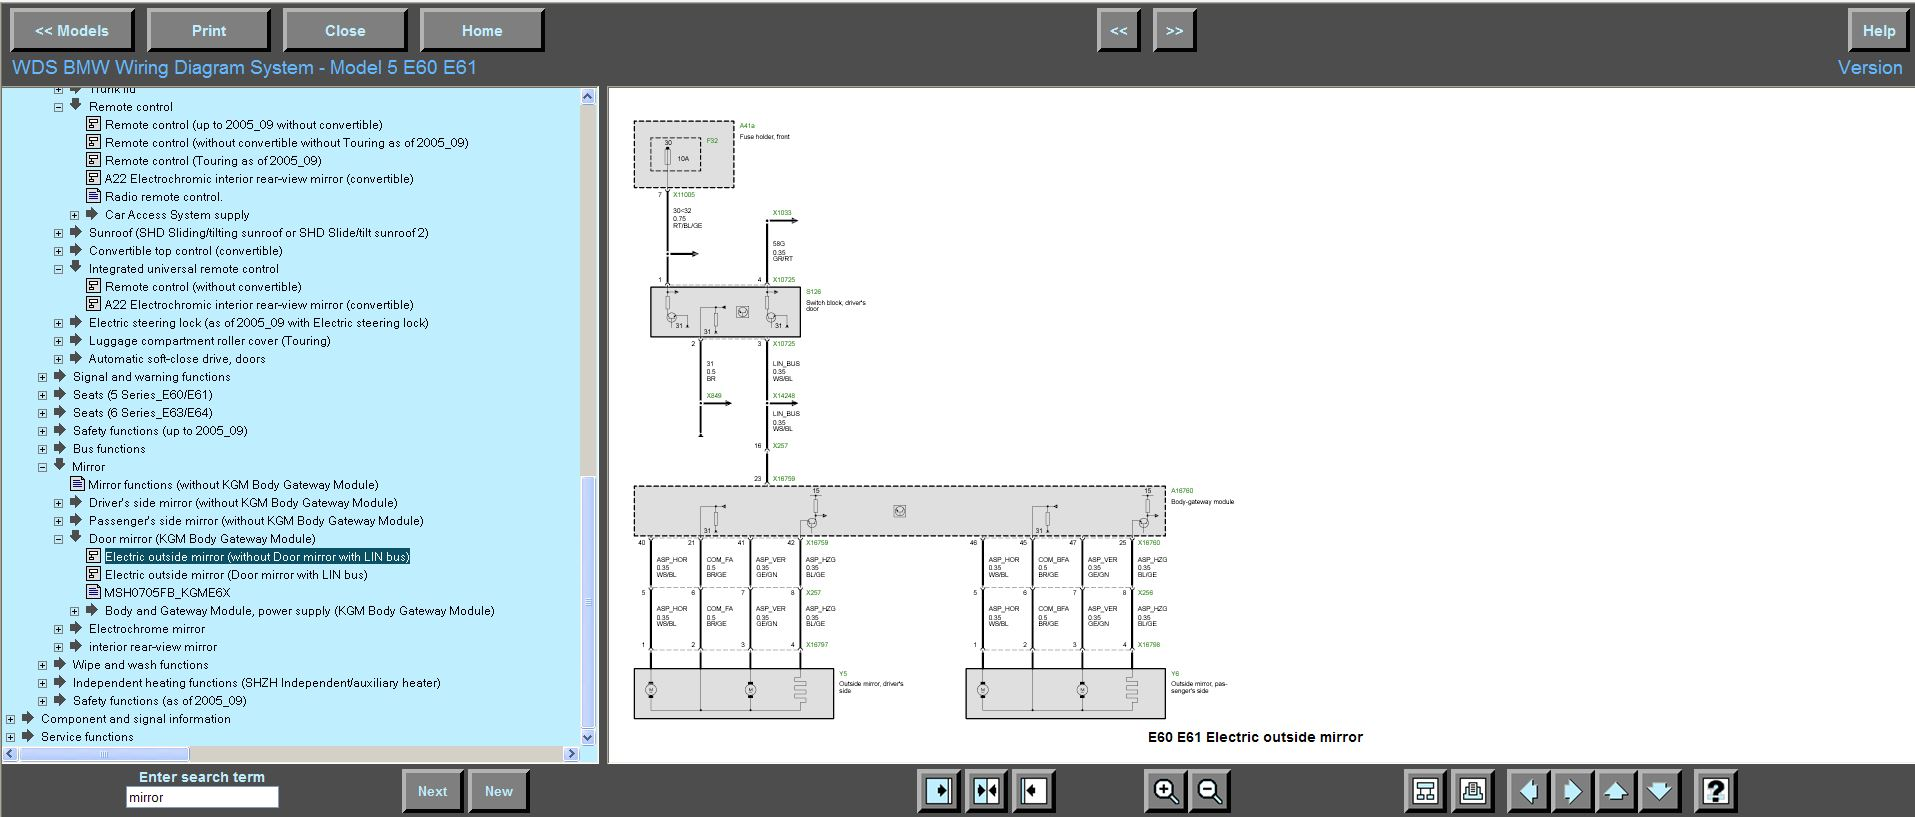 z1 wiring diagram ford 1g alternator wiring diagram harley davidson speed sensor wiring diagram. Black Bedroom Furniture Sets. Home Design Ideas